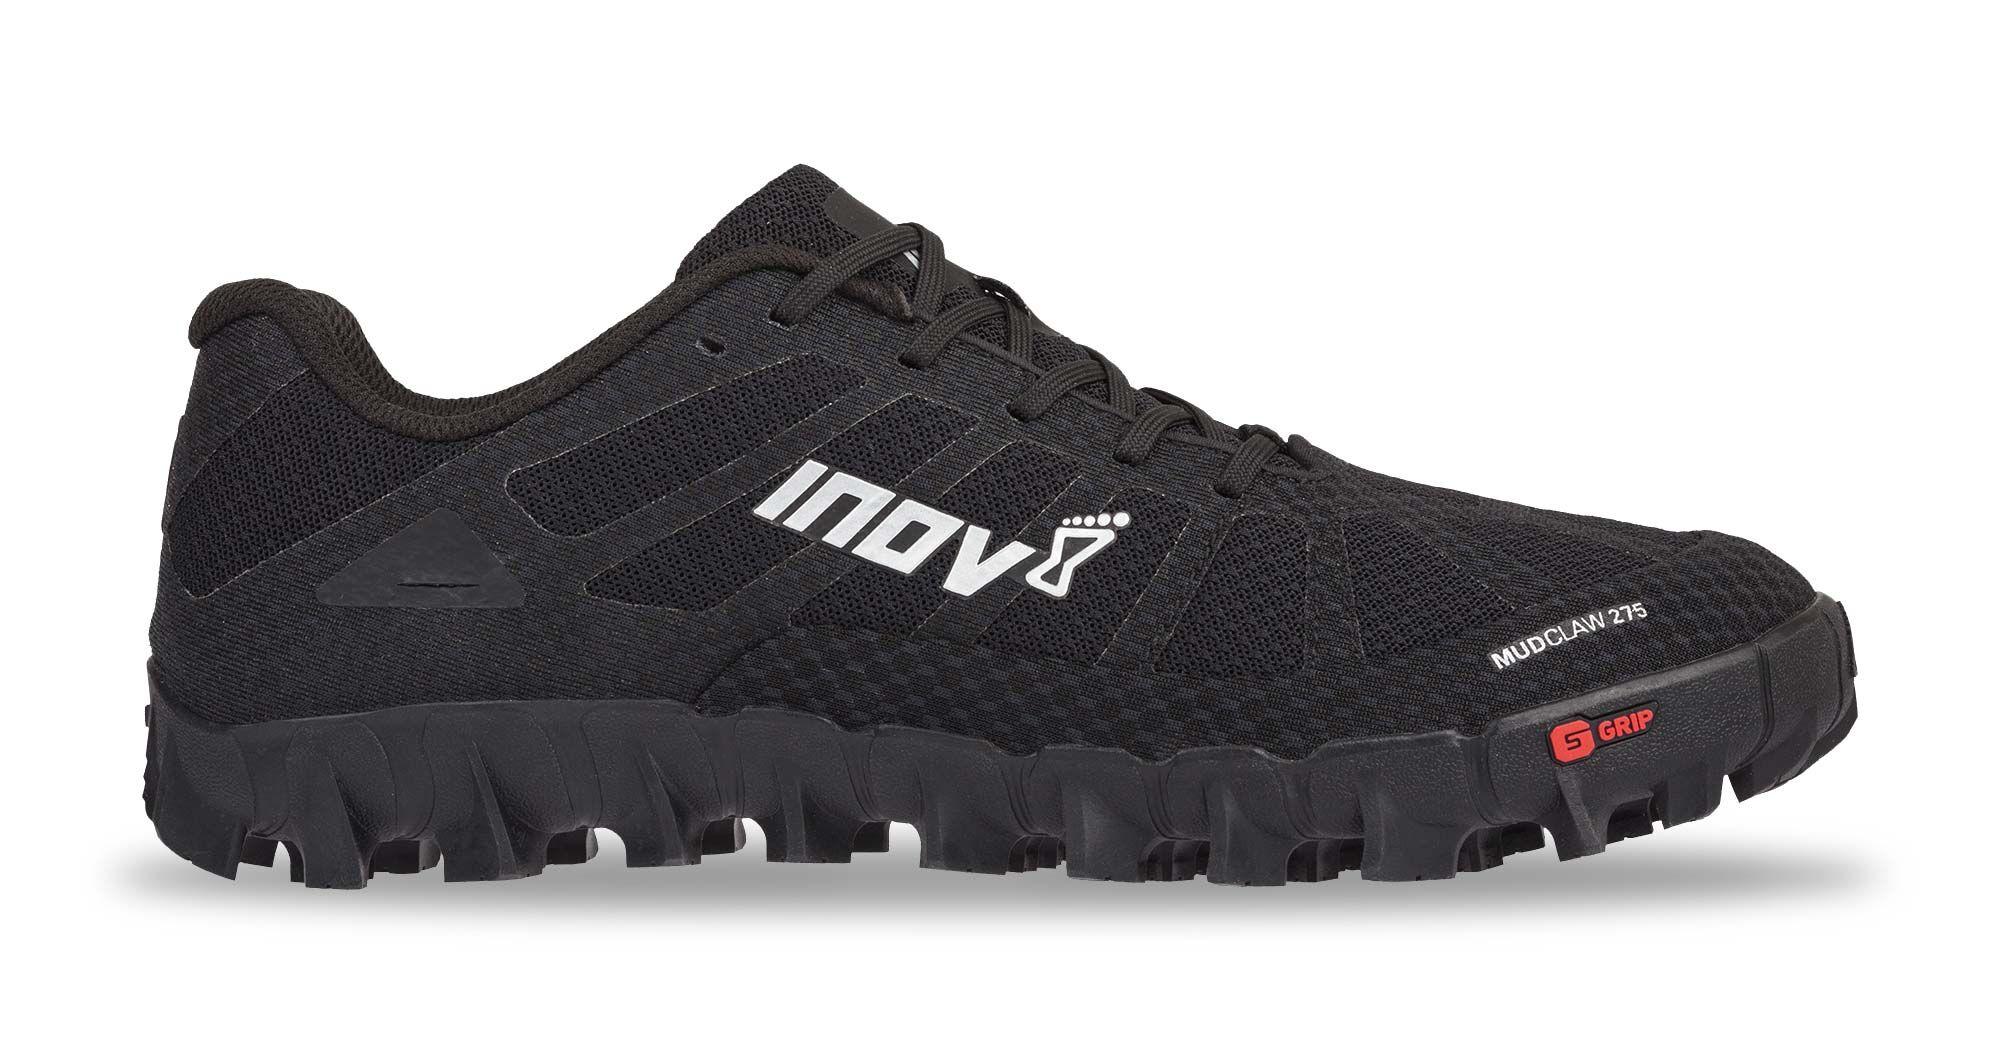 Mudclaw 275 Running Shoe | inov-8